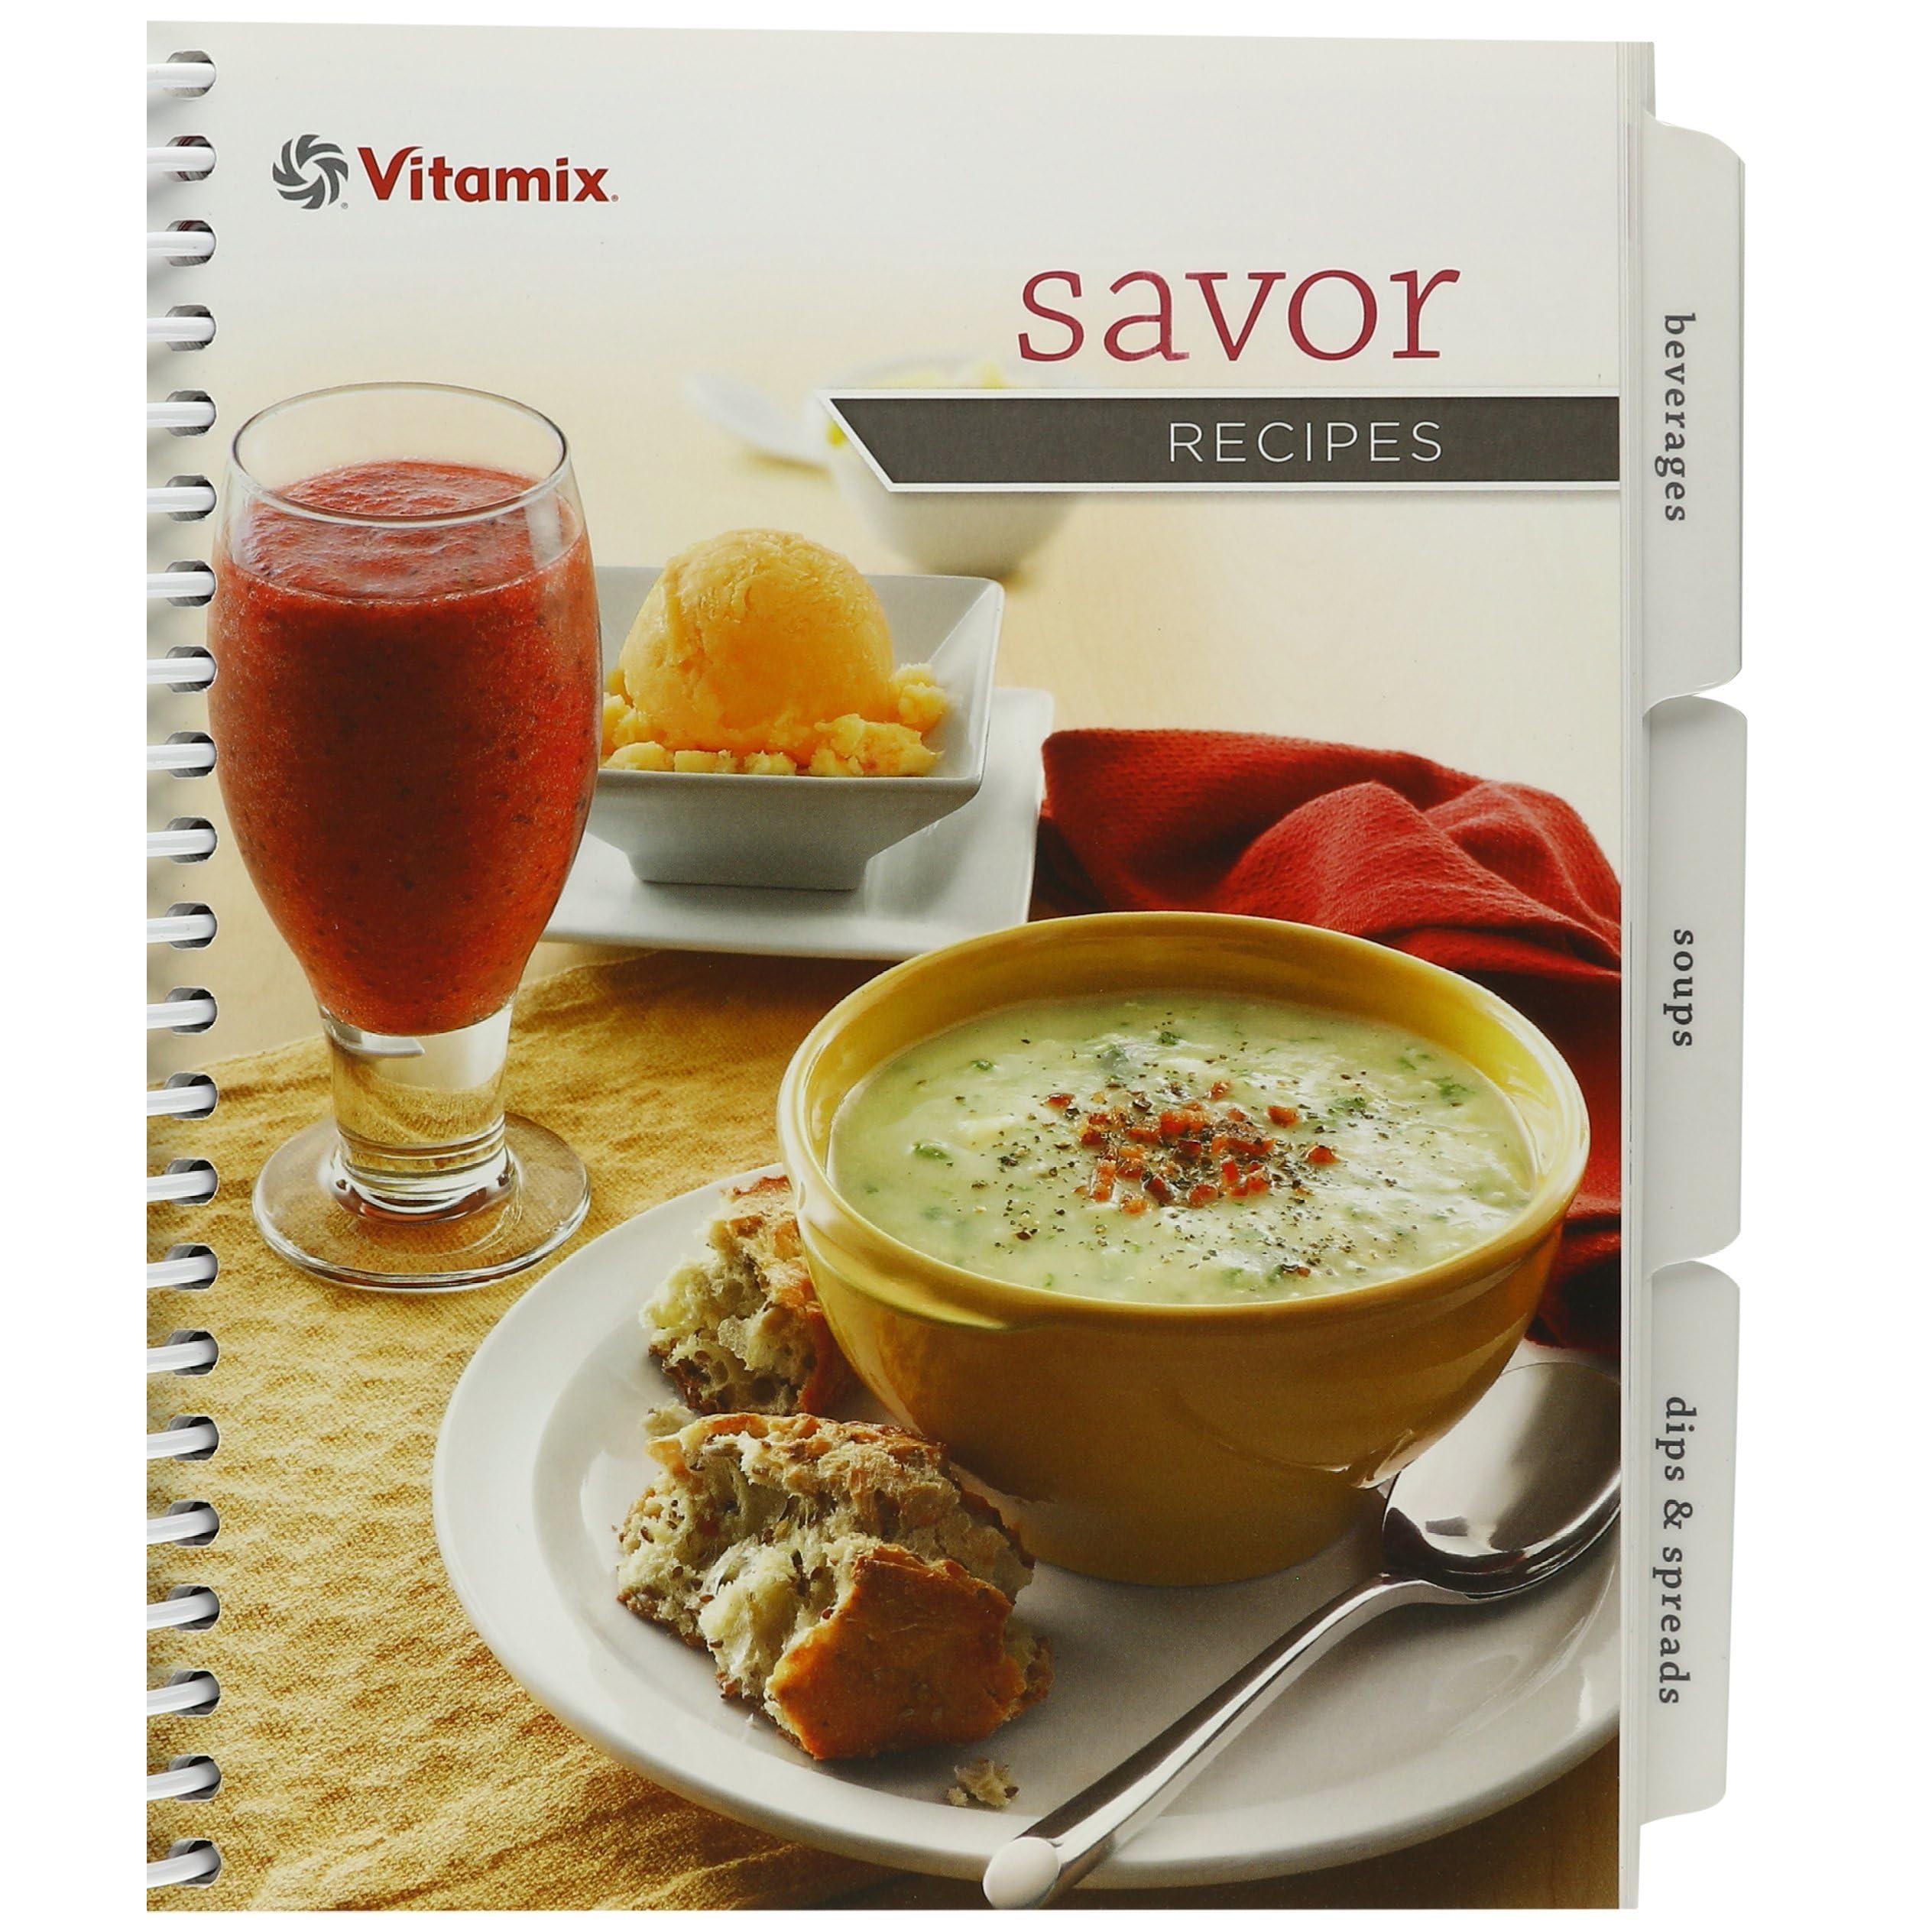 Vitamix savor recipes by vitamix forumfinder Choice Image